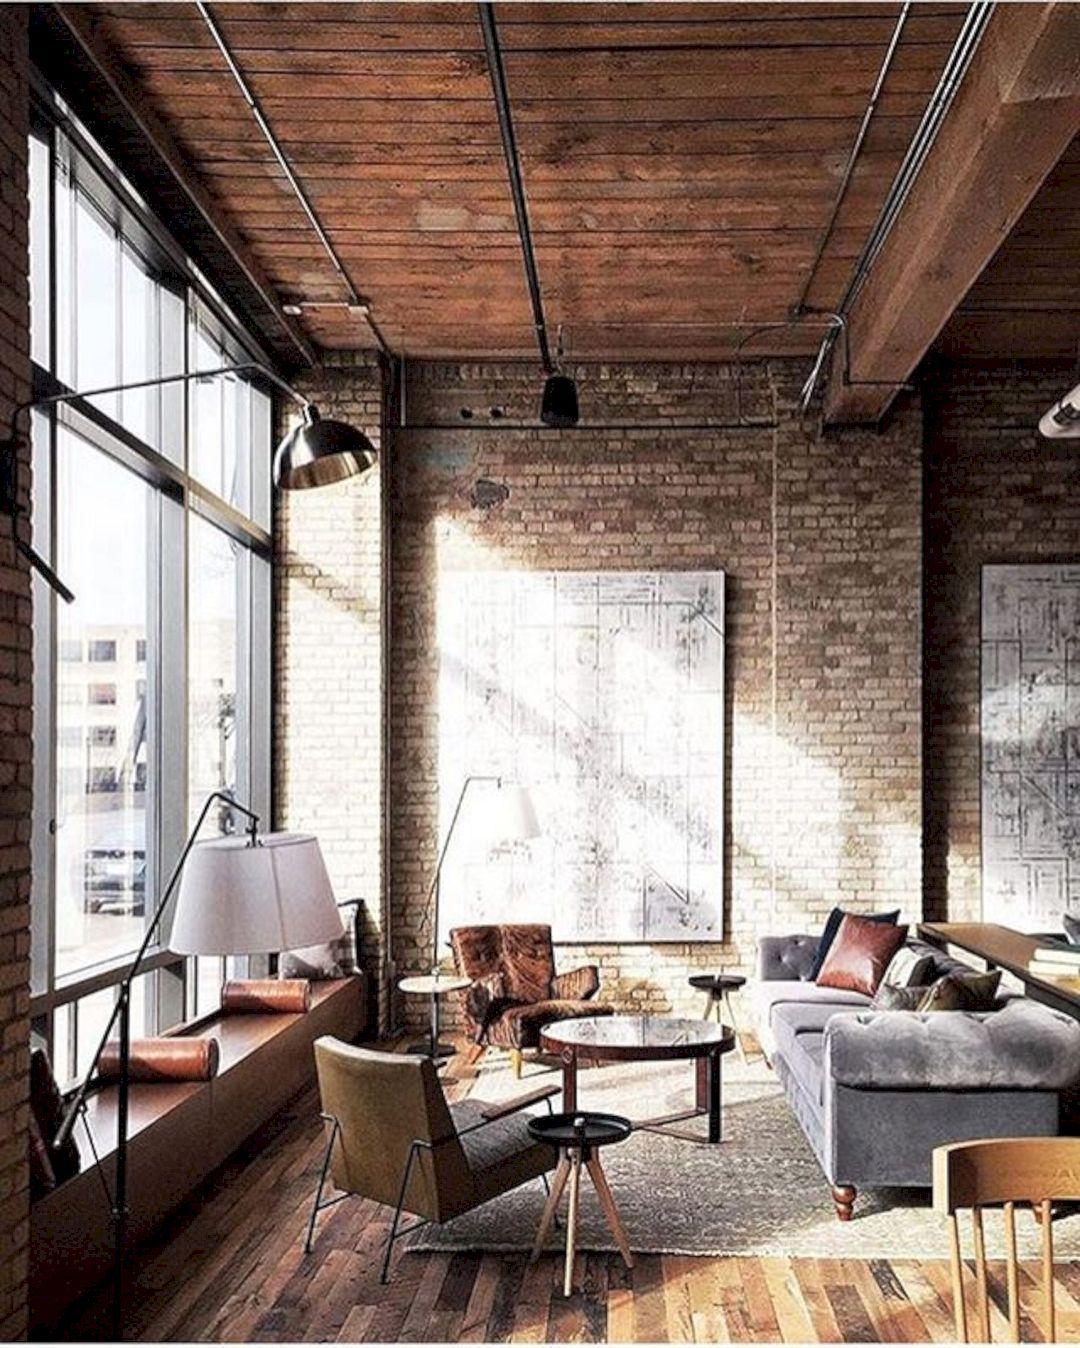 92 Beautiful Modern Apartment Interior Ideas  Https://www.futuristarchitecture.com/22343 Modern Apartment Interior Ideas. Html